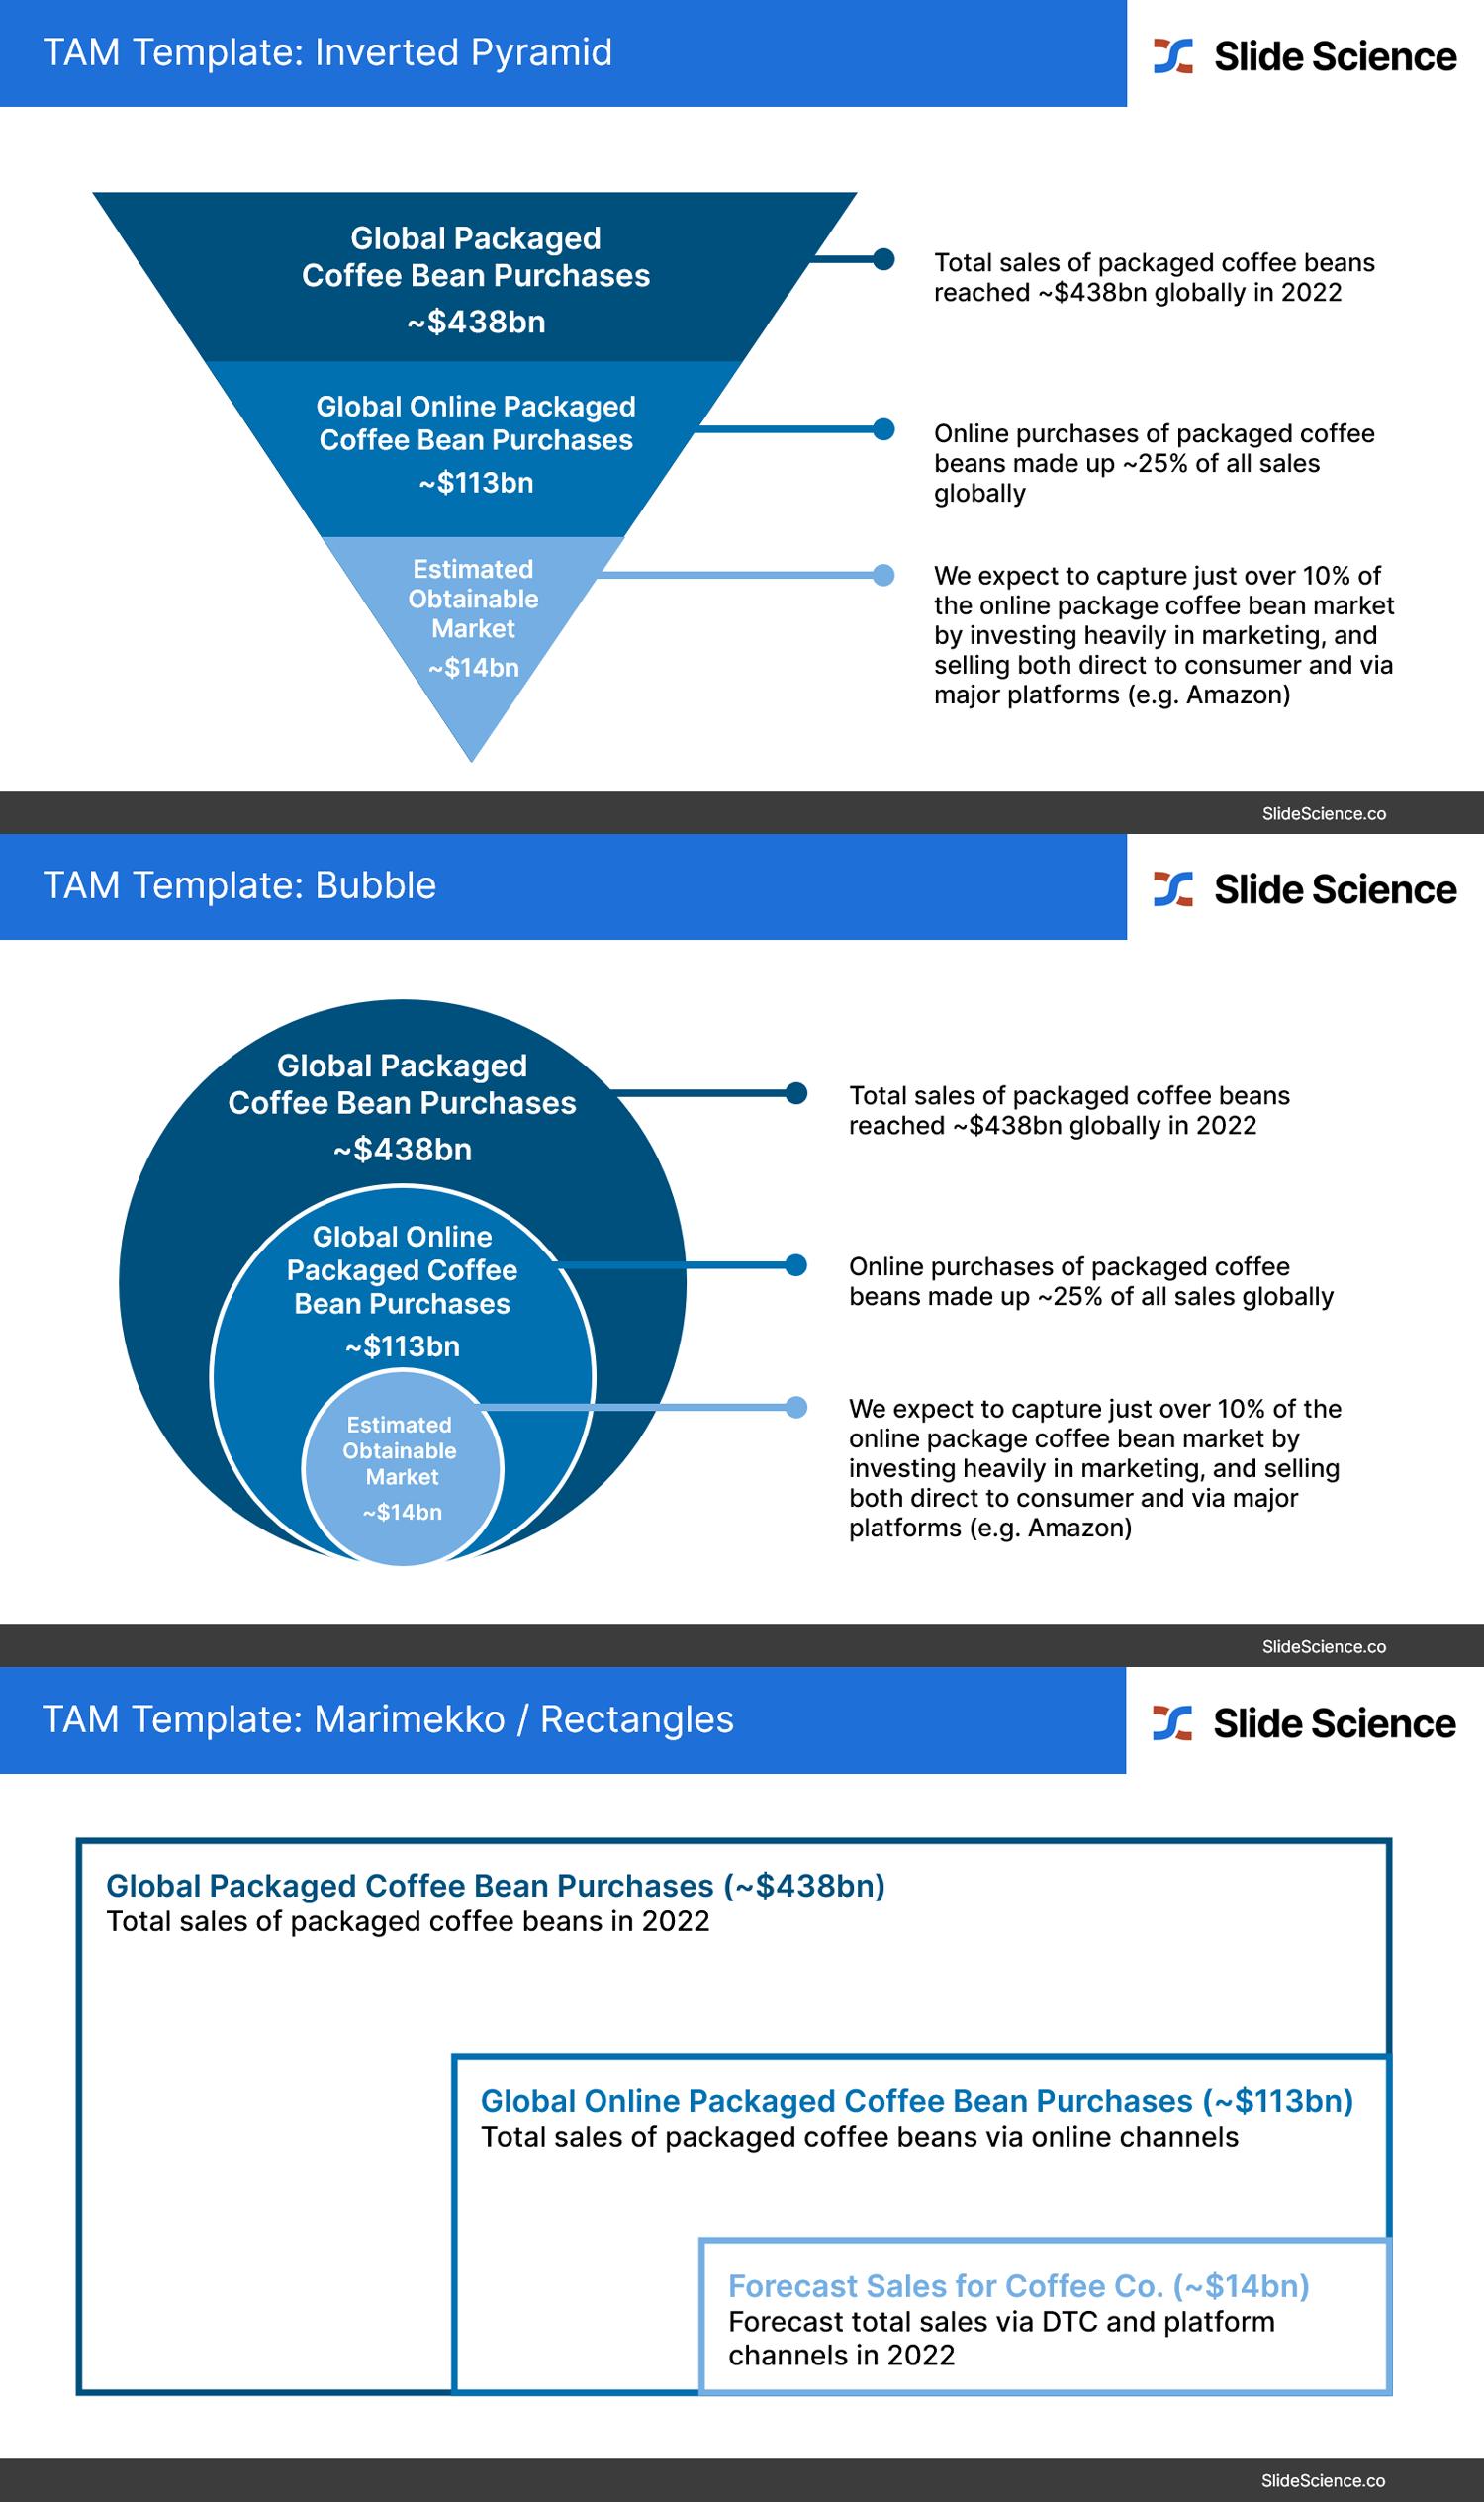 Free TAM Slide Templates by Slide Science